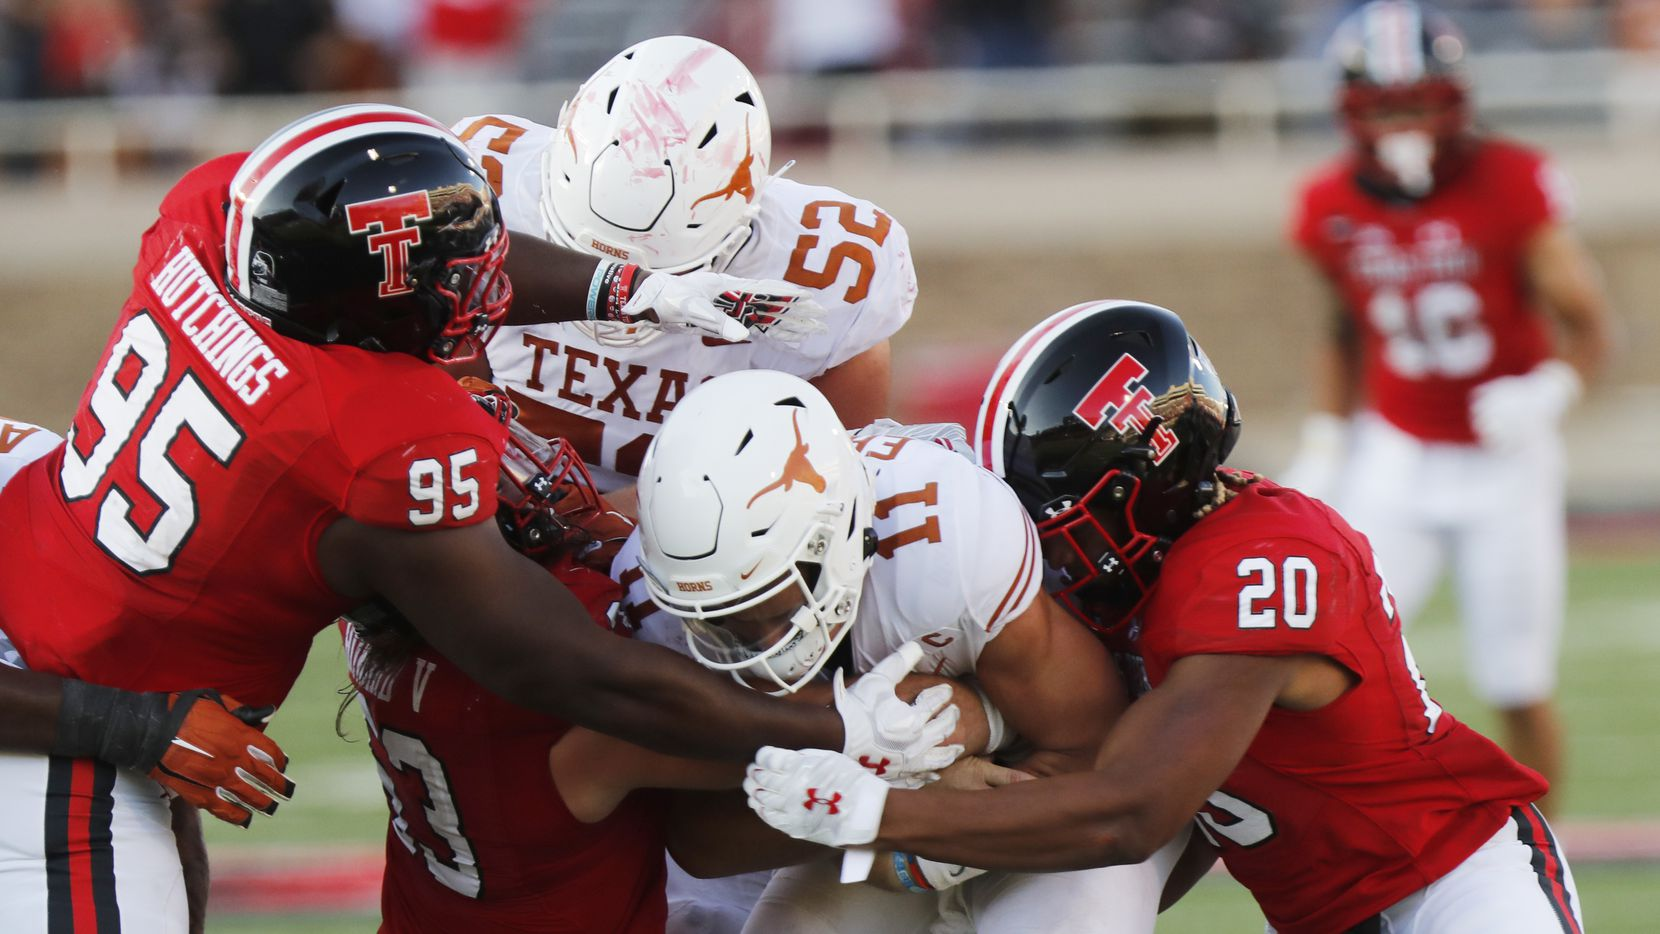 Texas Tech defensive lineman Jaylon Hutchings and linebacker Kosi Eldridge tackle Texas quarterback Sam Ehlinger during the second half of an NCAA college football game against Texas Tech, Saturday Sept. 26, 2020, in Lubbock, Texas. (AP Photo/Mark Rogers)